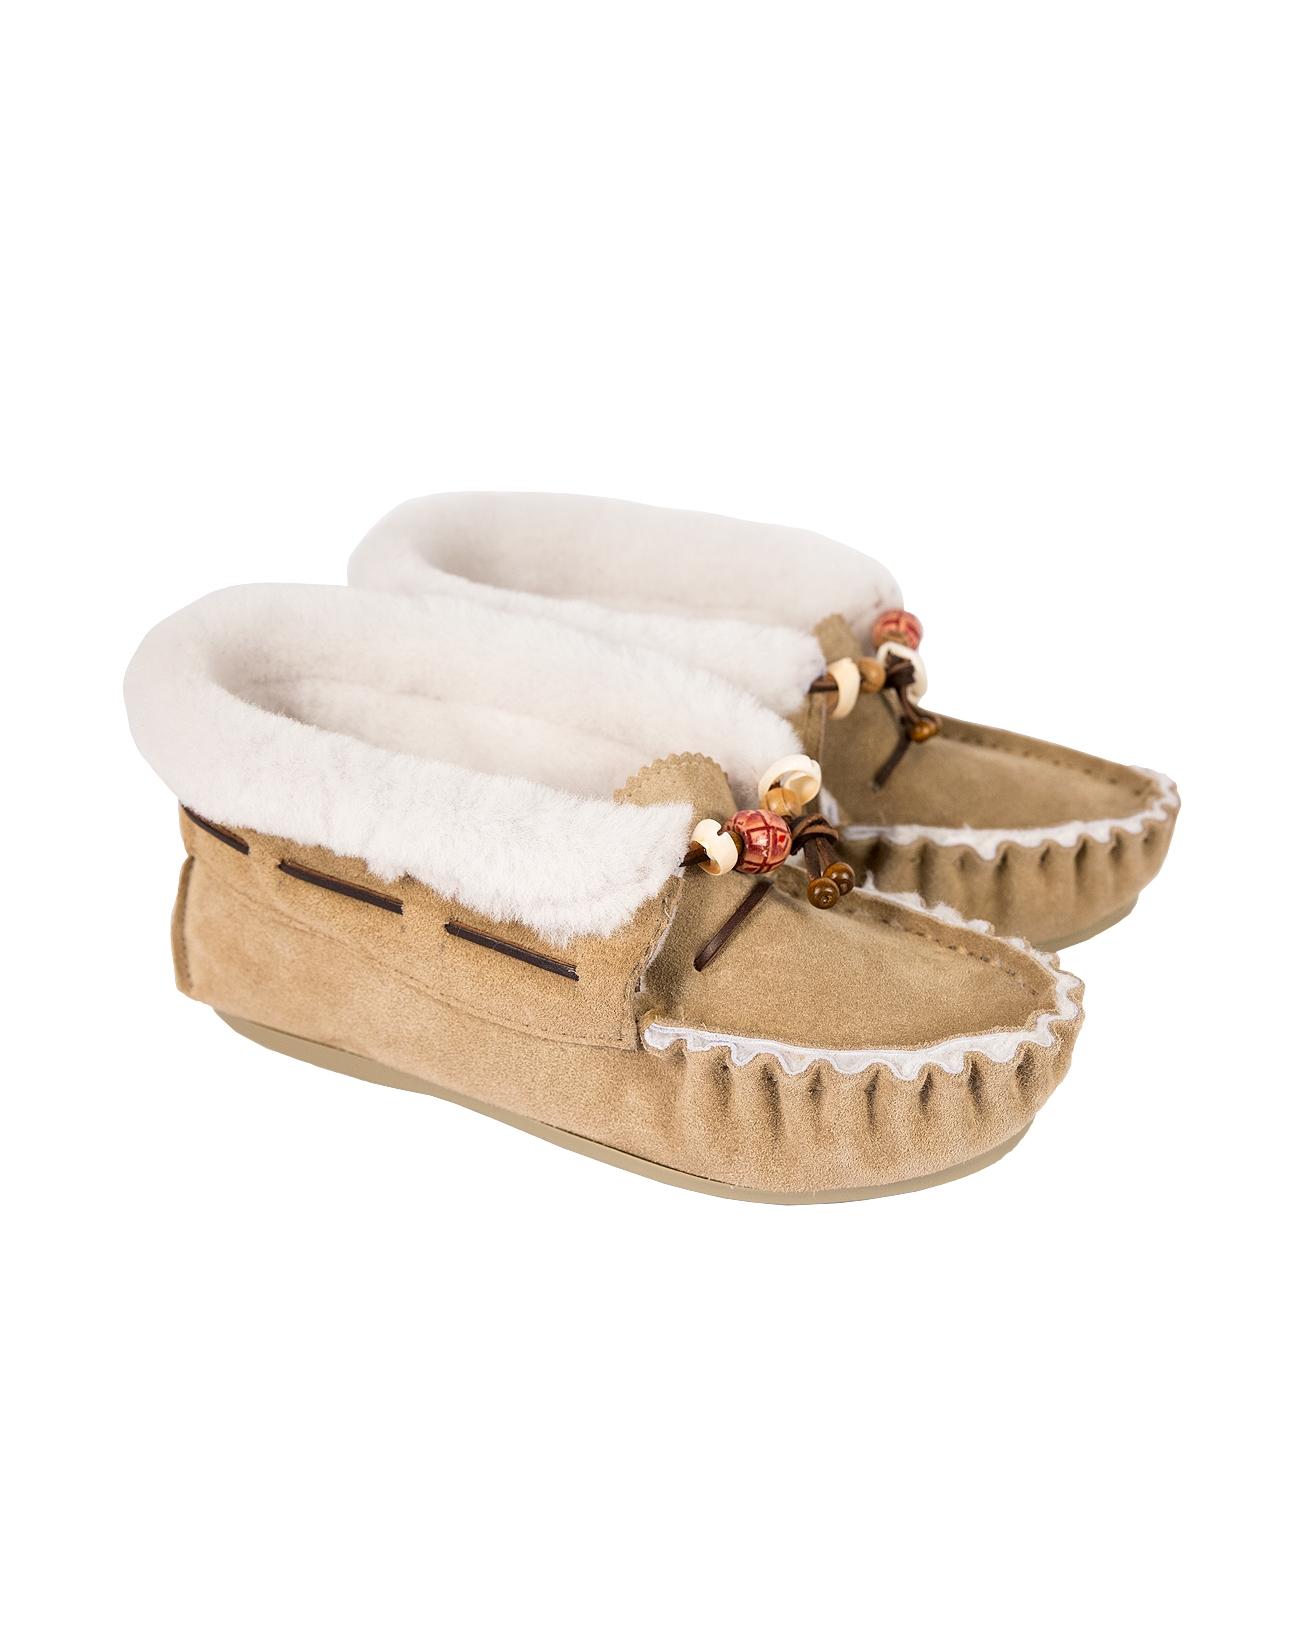 Lakota Moccasins - Size 8 - Camel - 526